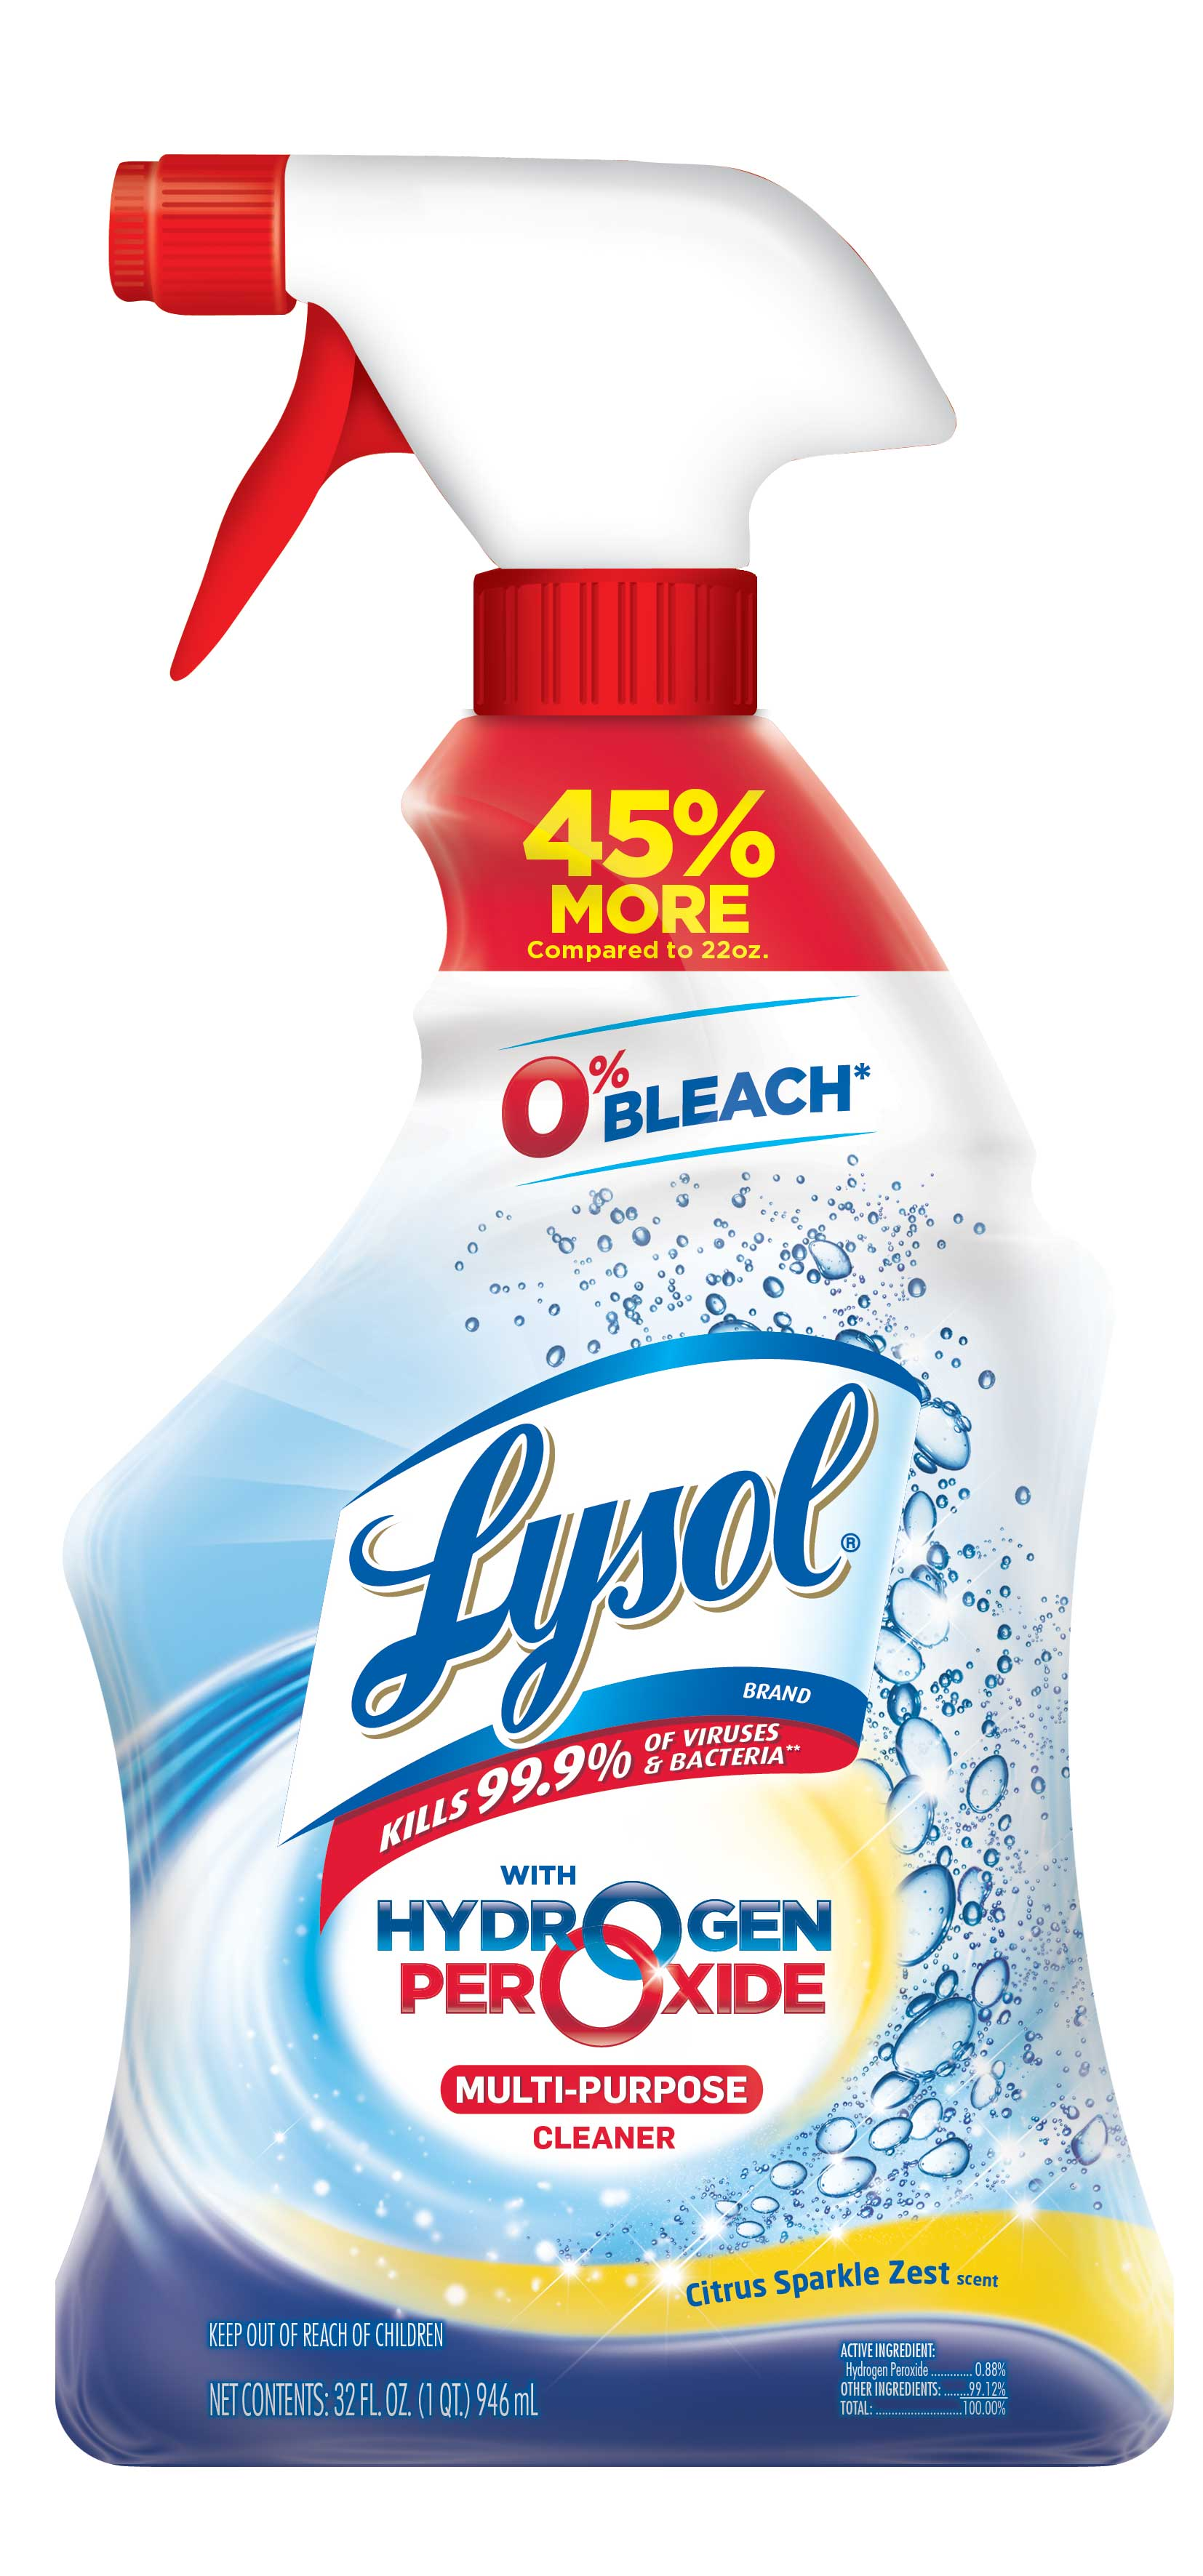 Lysol Bleach Free Hydrogen Peroxide Multi-Purpose Cleaner Citrus 32oz